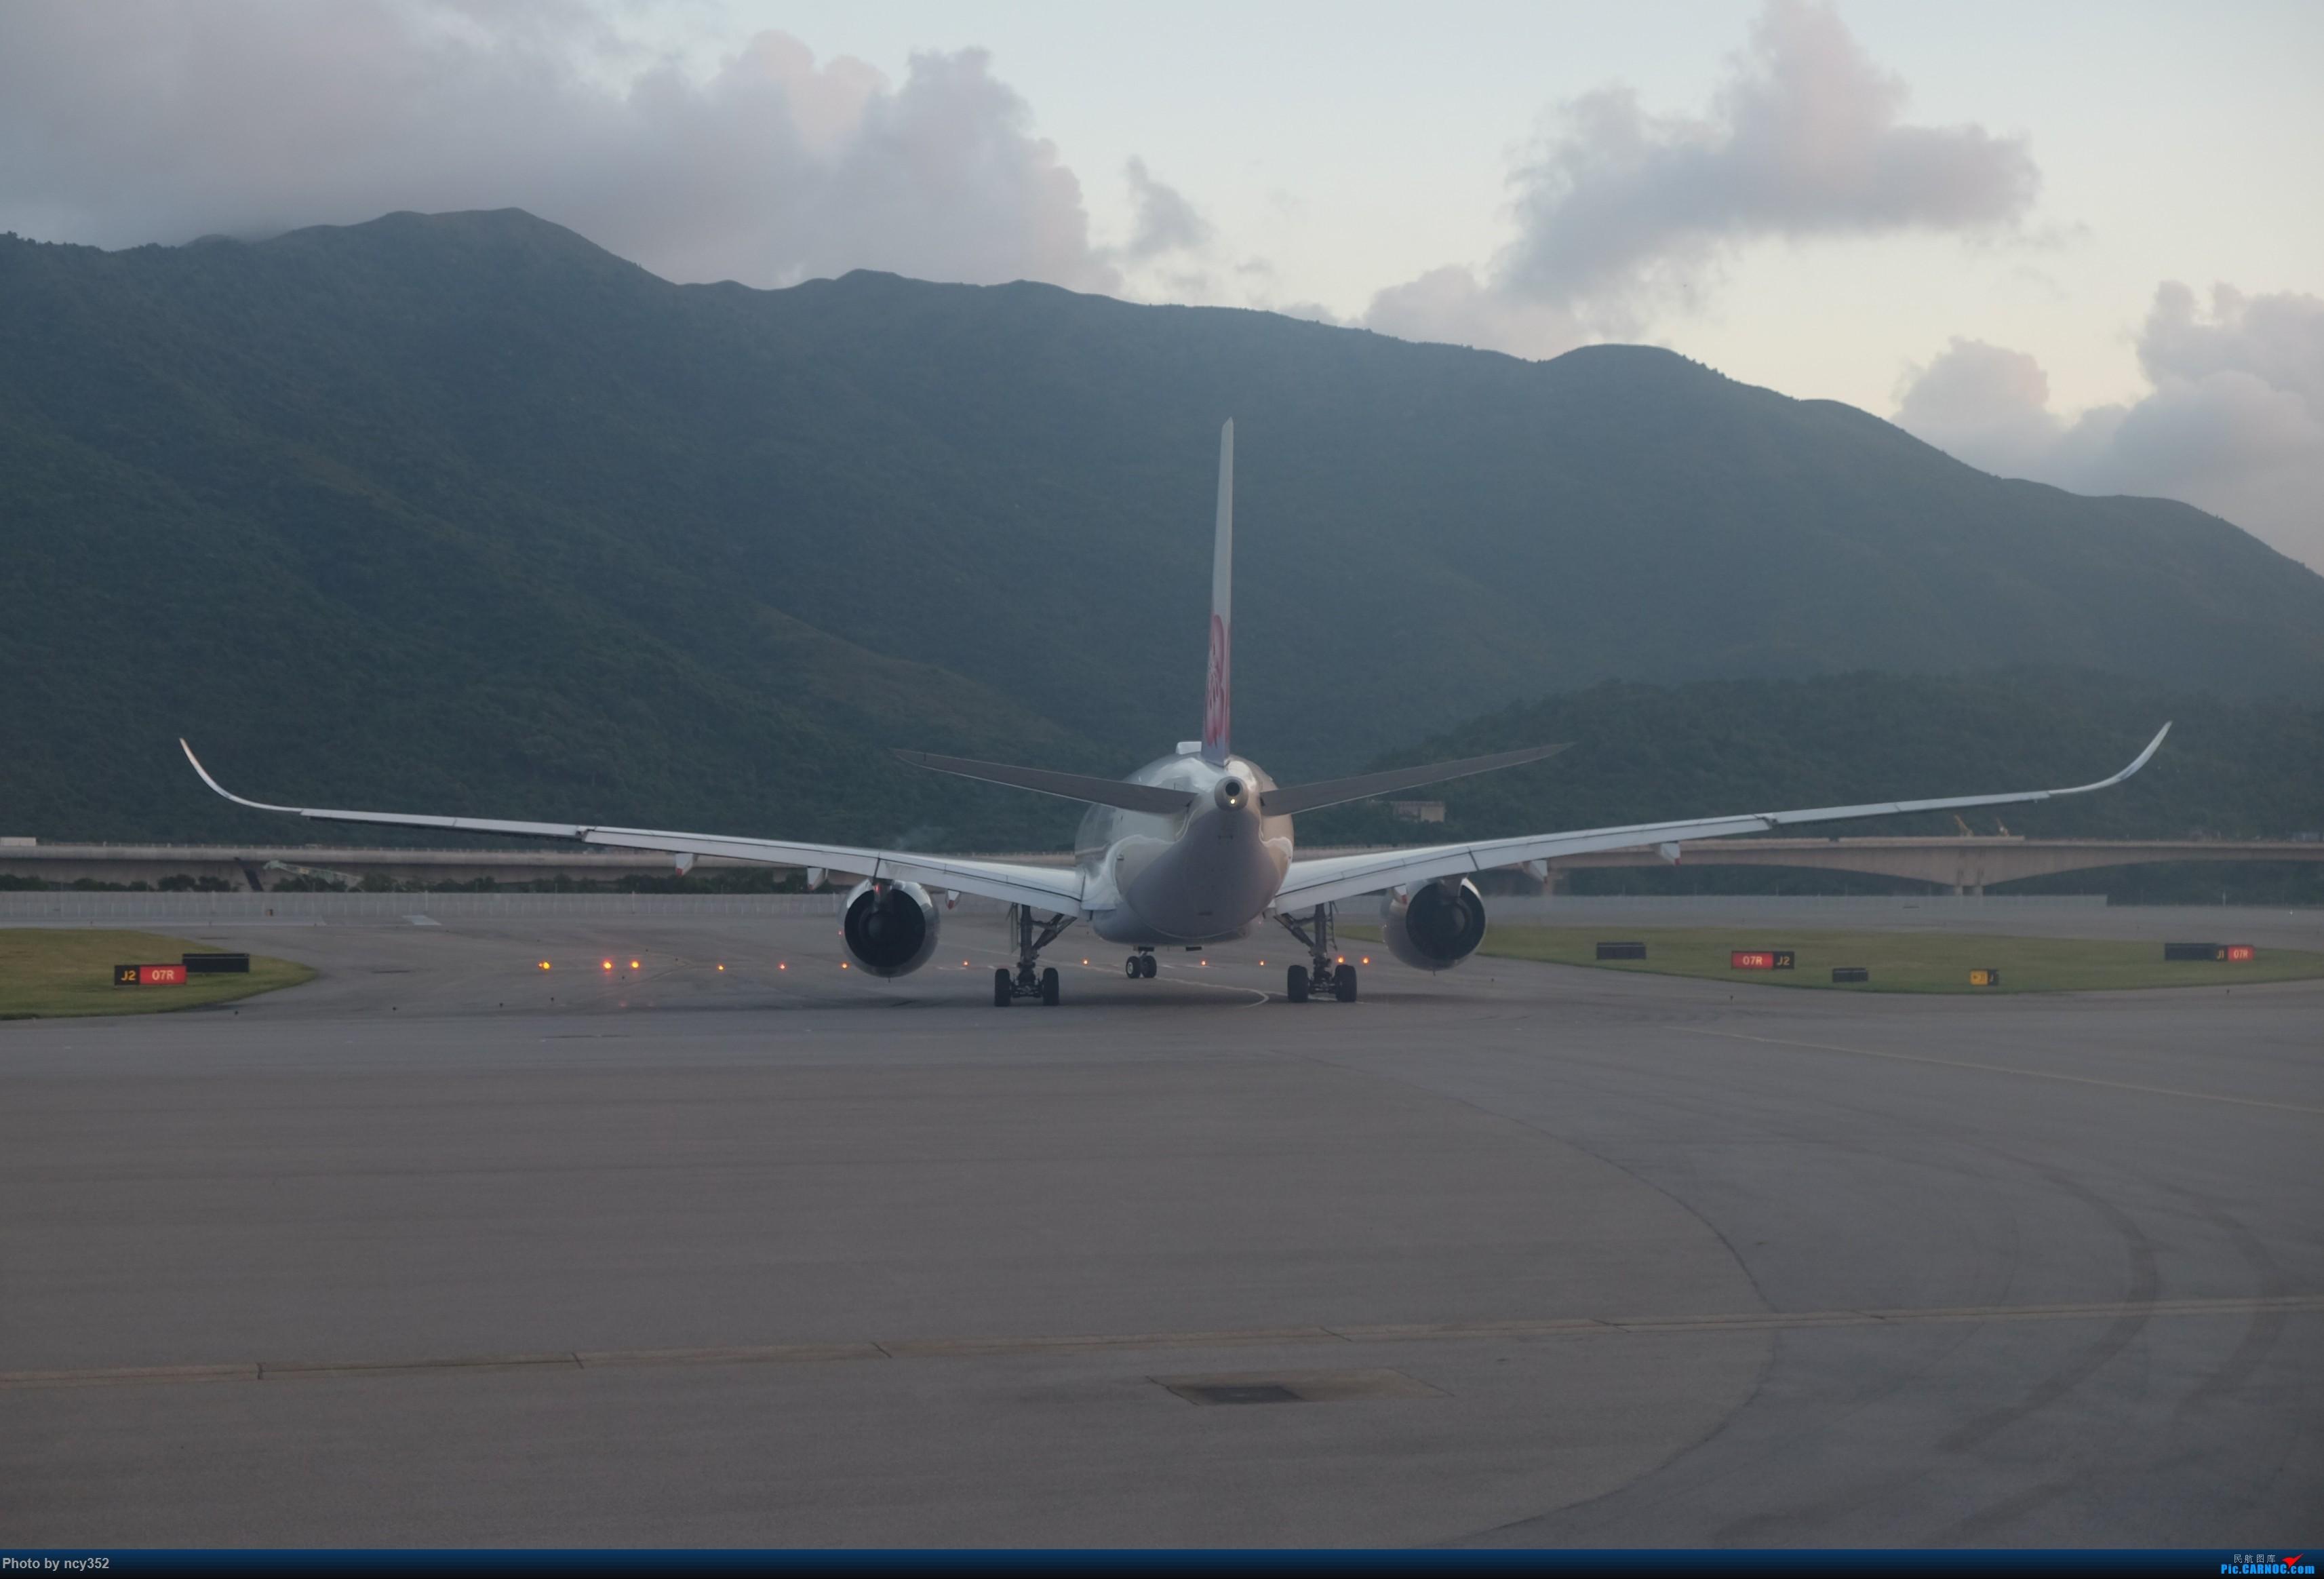 Re:[原创]20171001 HKG-CTU AIRBUS A350-900 B-18905 中国香港国际机场